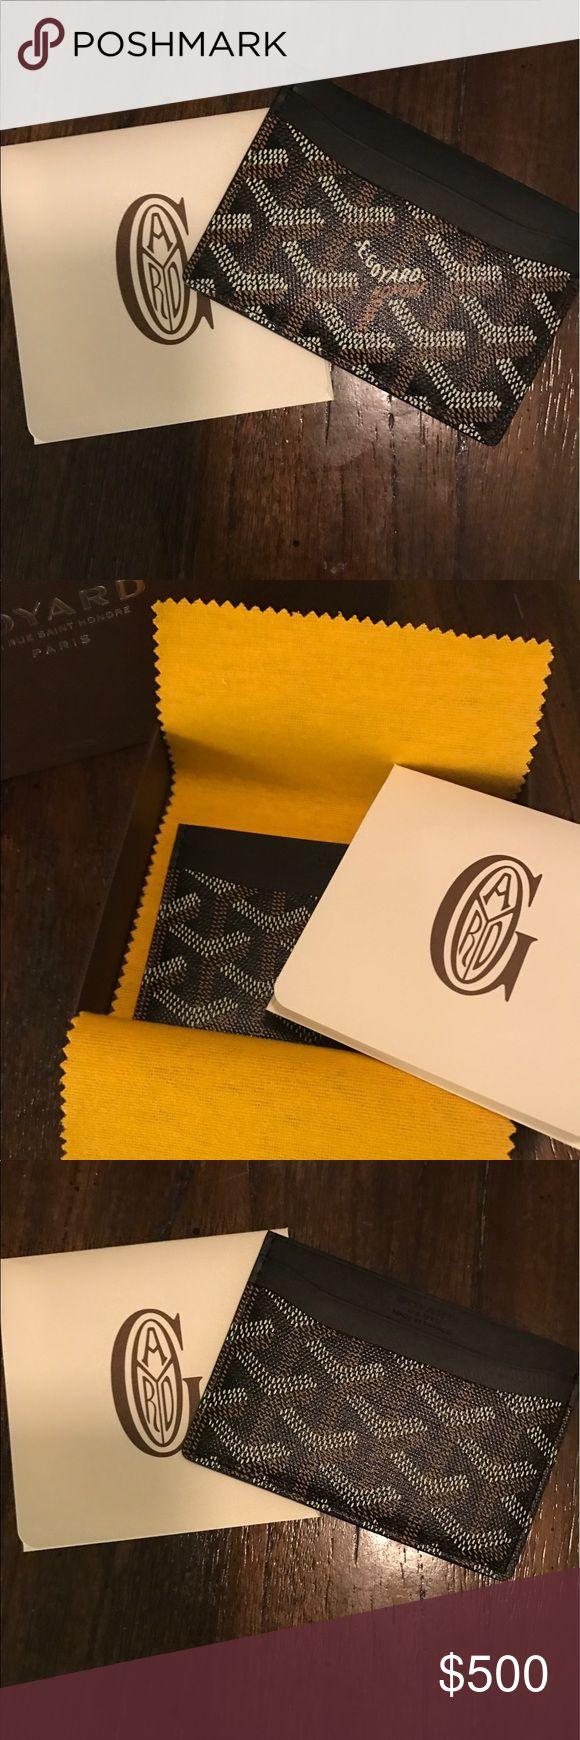 New Goyard Card Holder BRAND NEW never been used Goyard card holder in brown/black. Never used 100% authentic Goyard Accessories Key & Card Holders